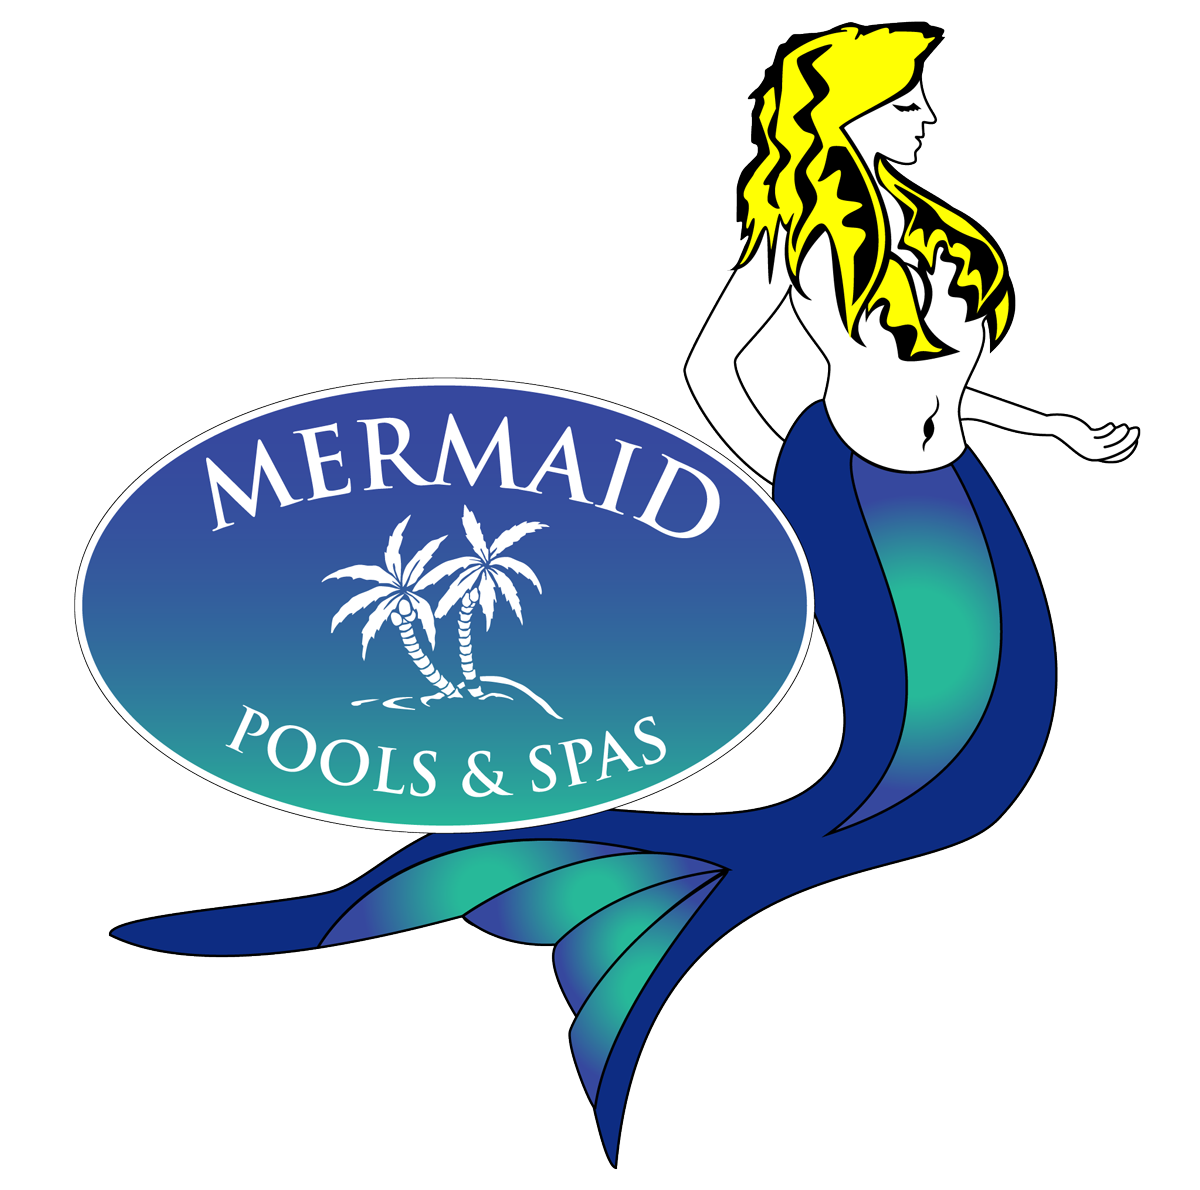 mermaid pools & spas logo